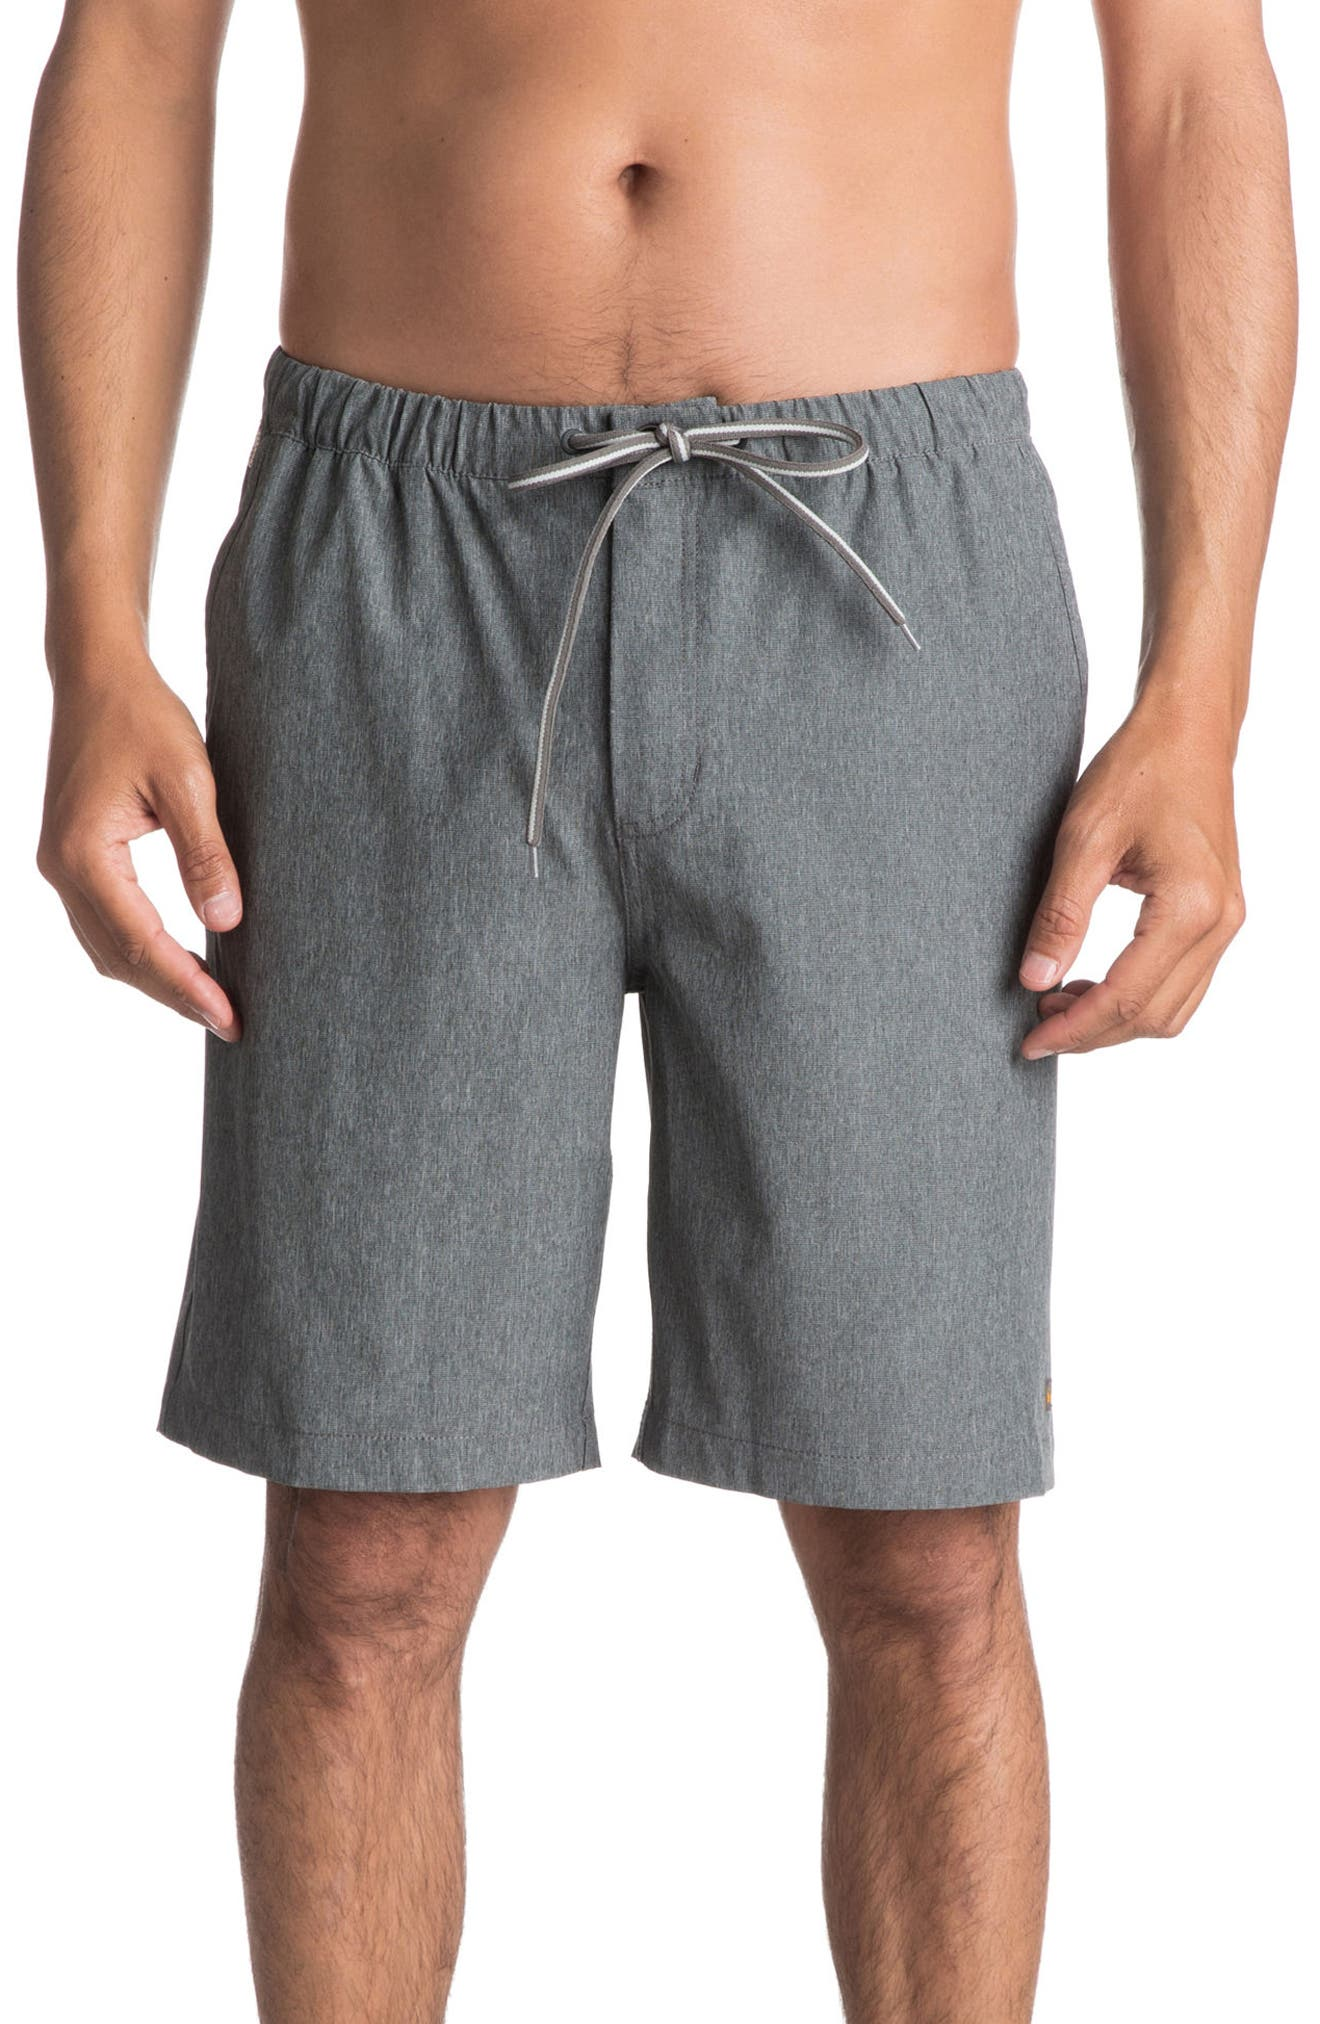 Suva Amphibian Shorts,                             Main thumbnail 1, color,                             002